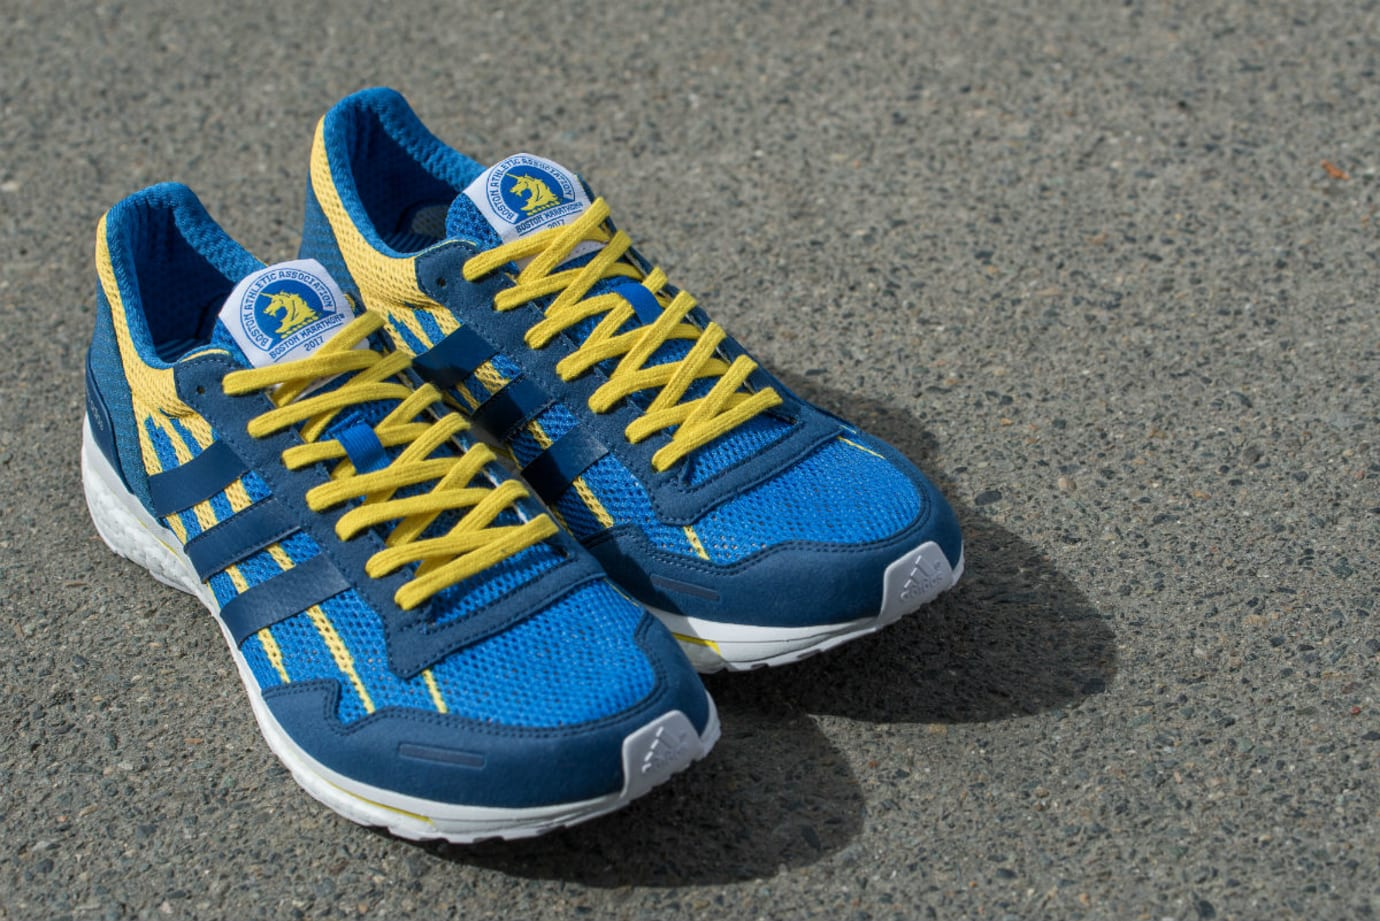 Adidas Adizero Adios Boston Marathon 2017 Front